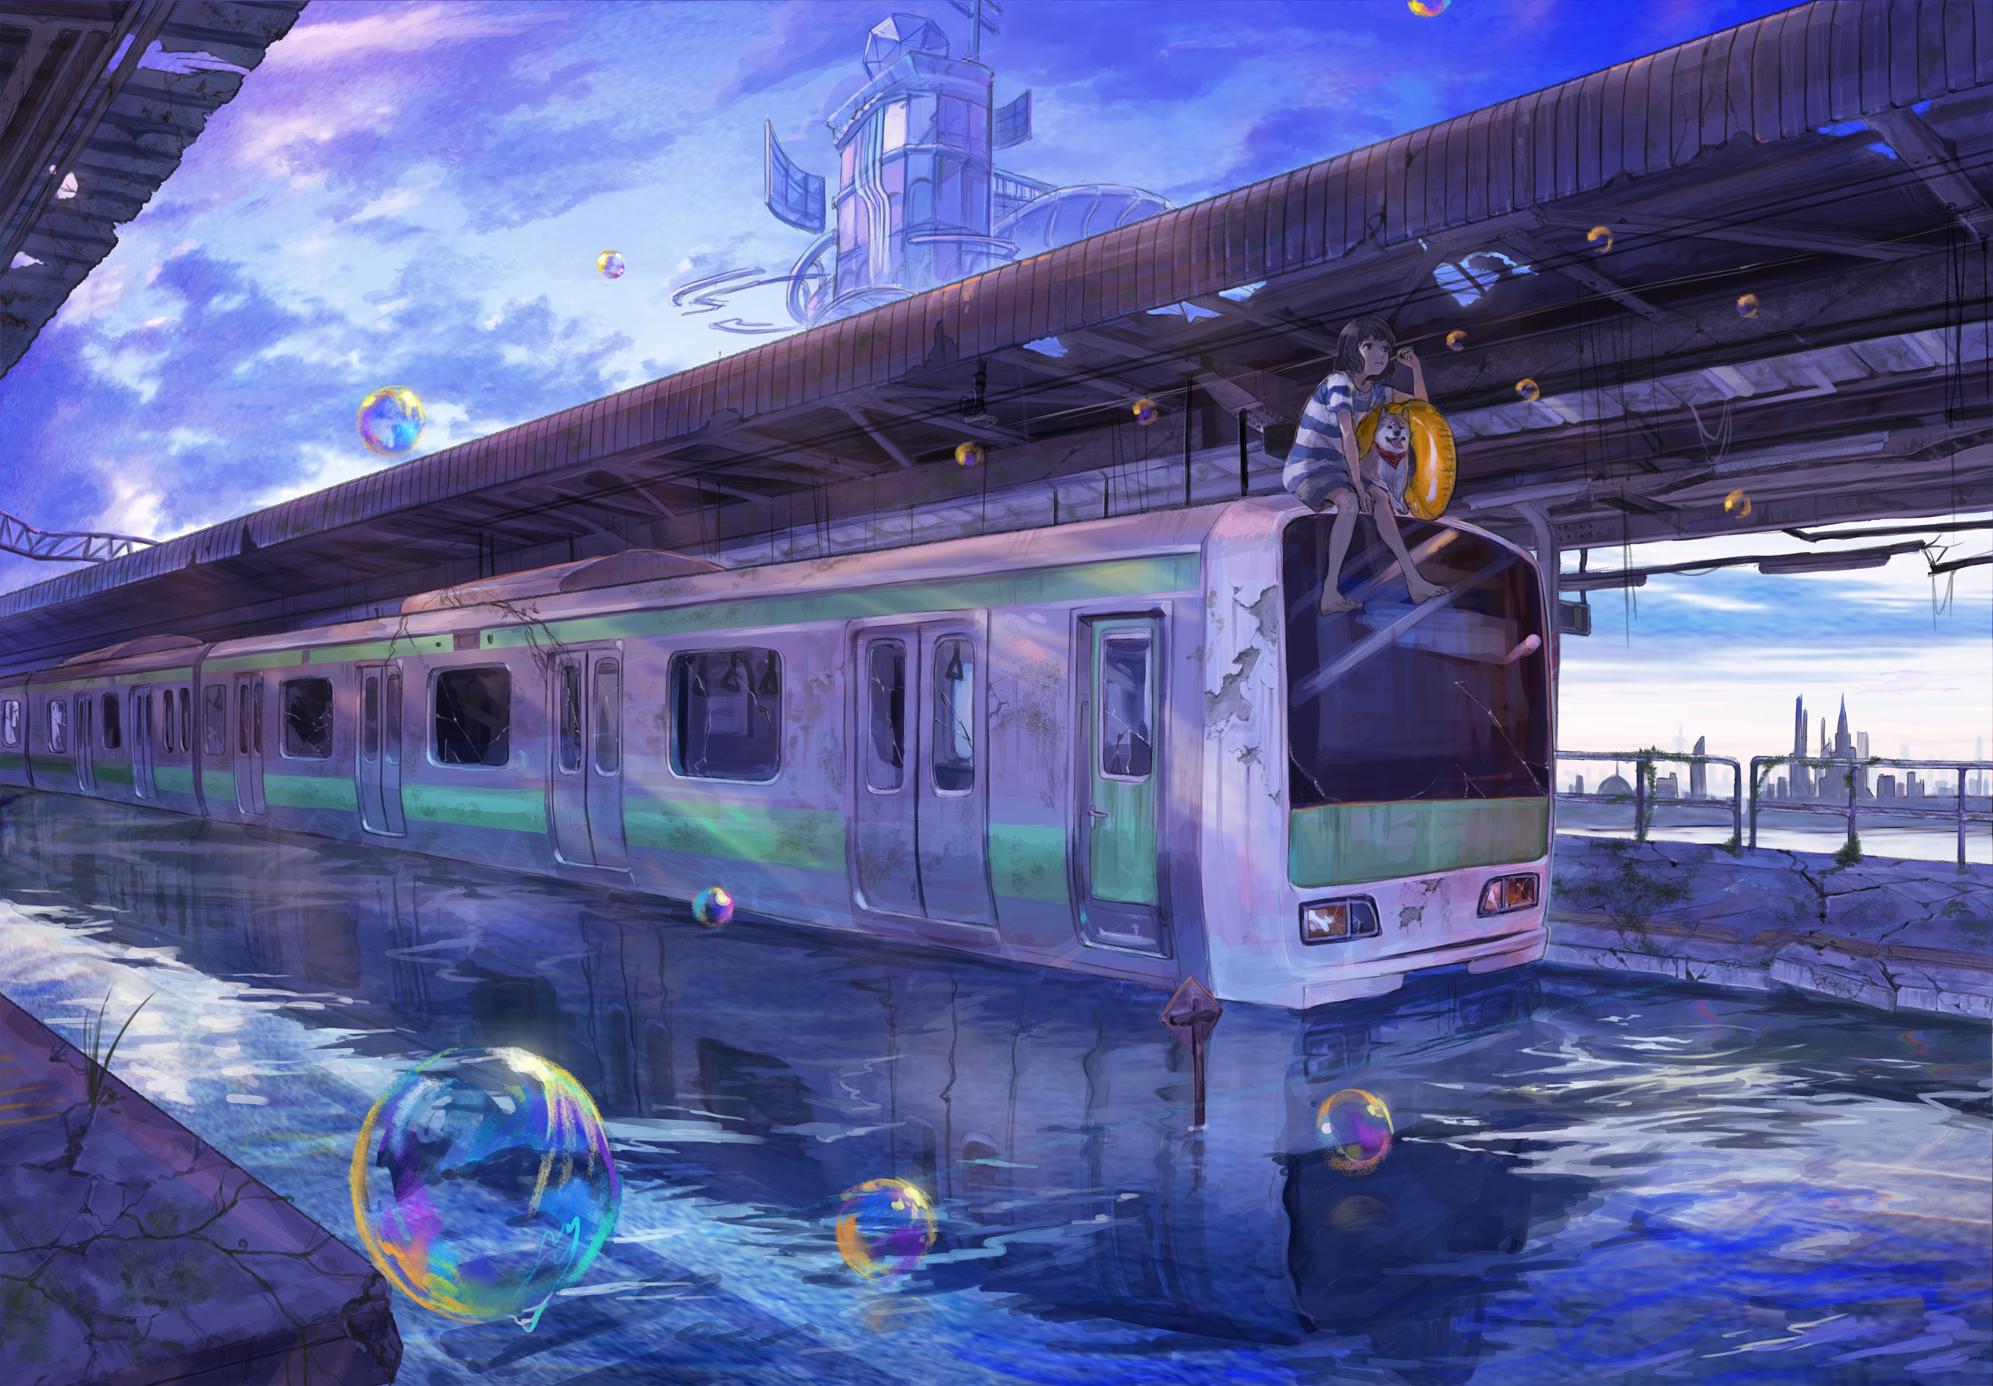 Wallpaper : city, anime girls, short hair, metropolis